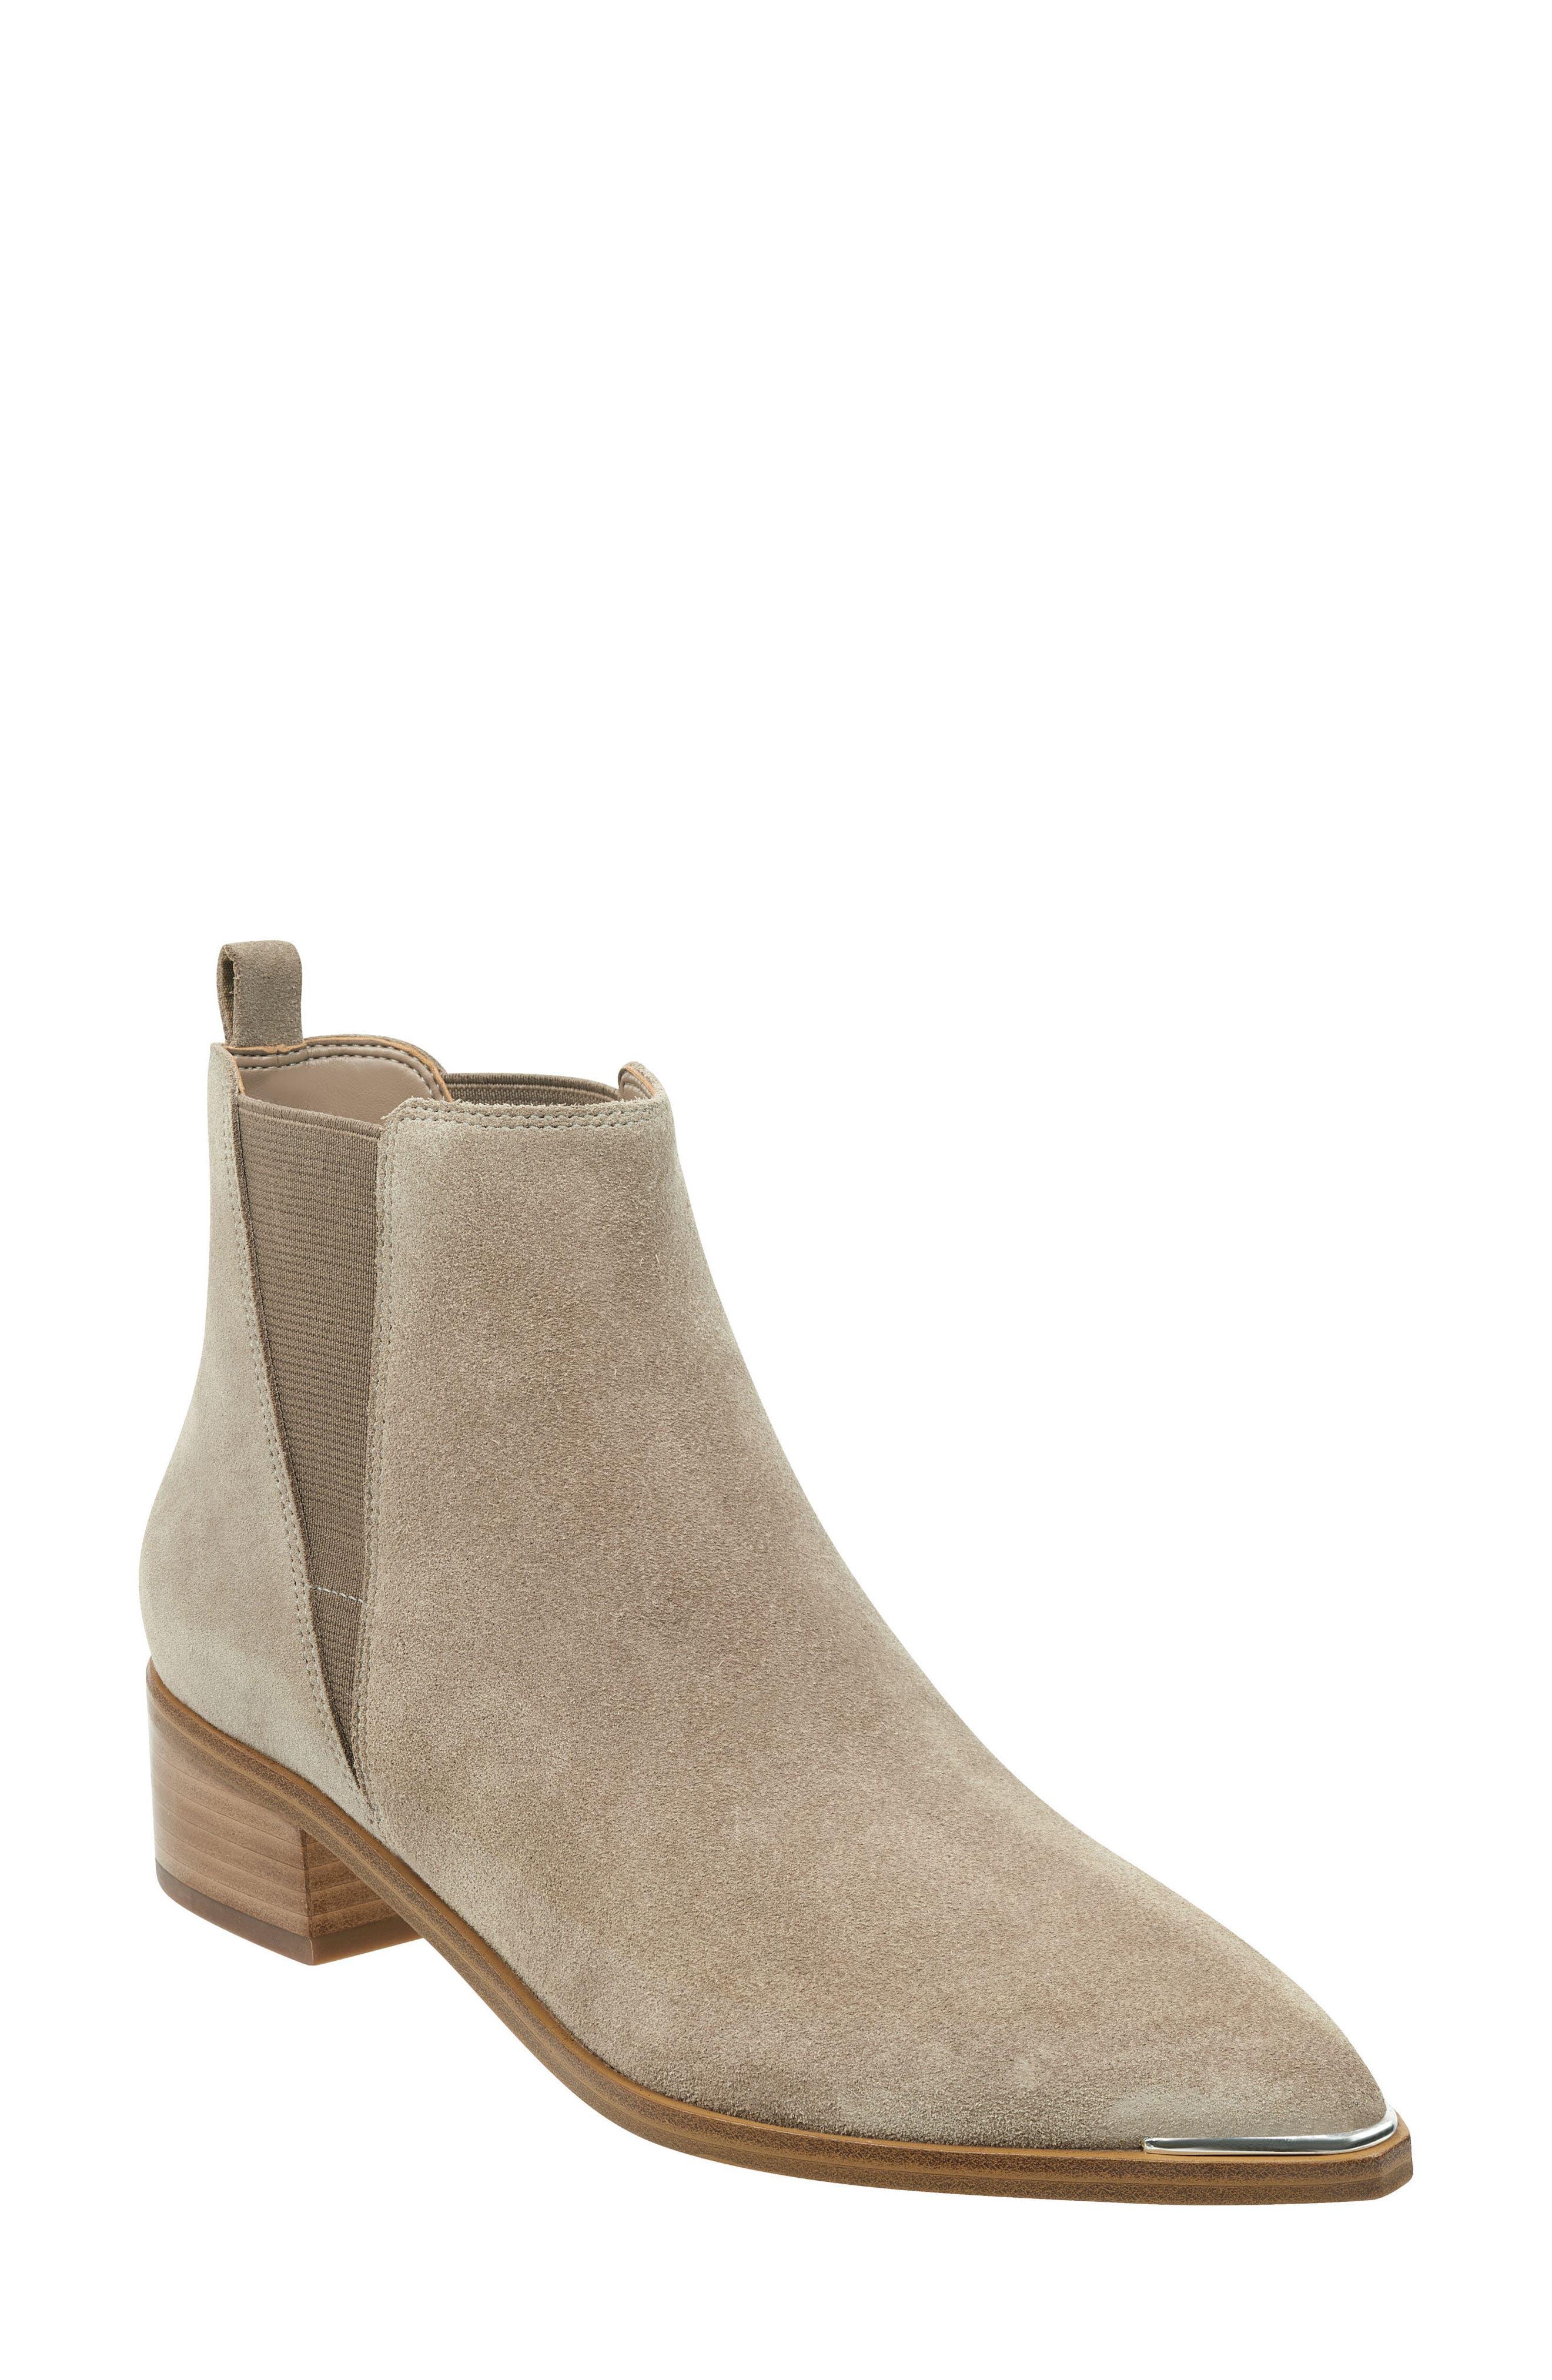 'Yale' Chelsea Boot,                         Main,                         color, CLOUD SUEDE